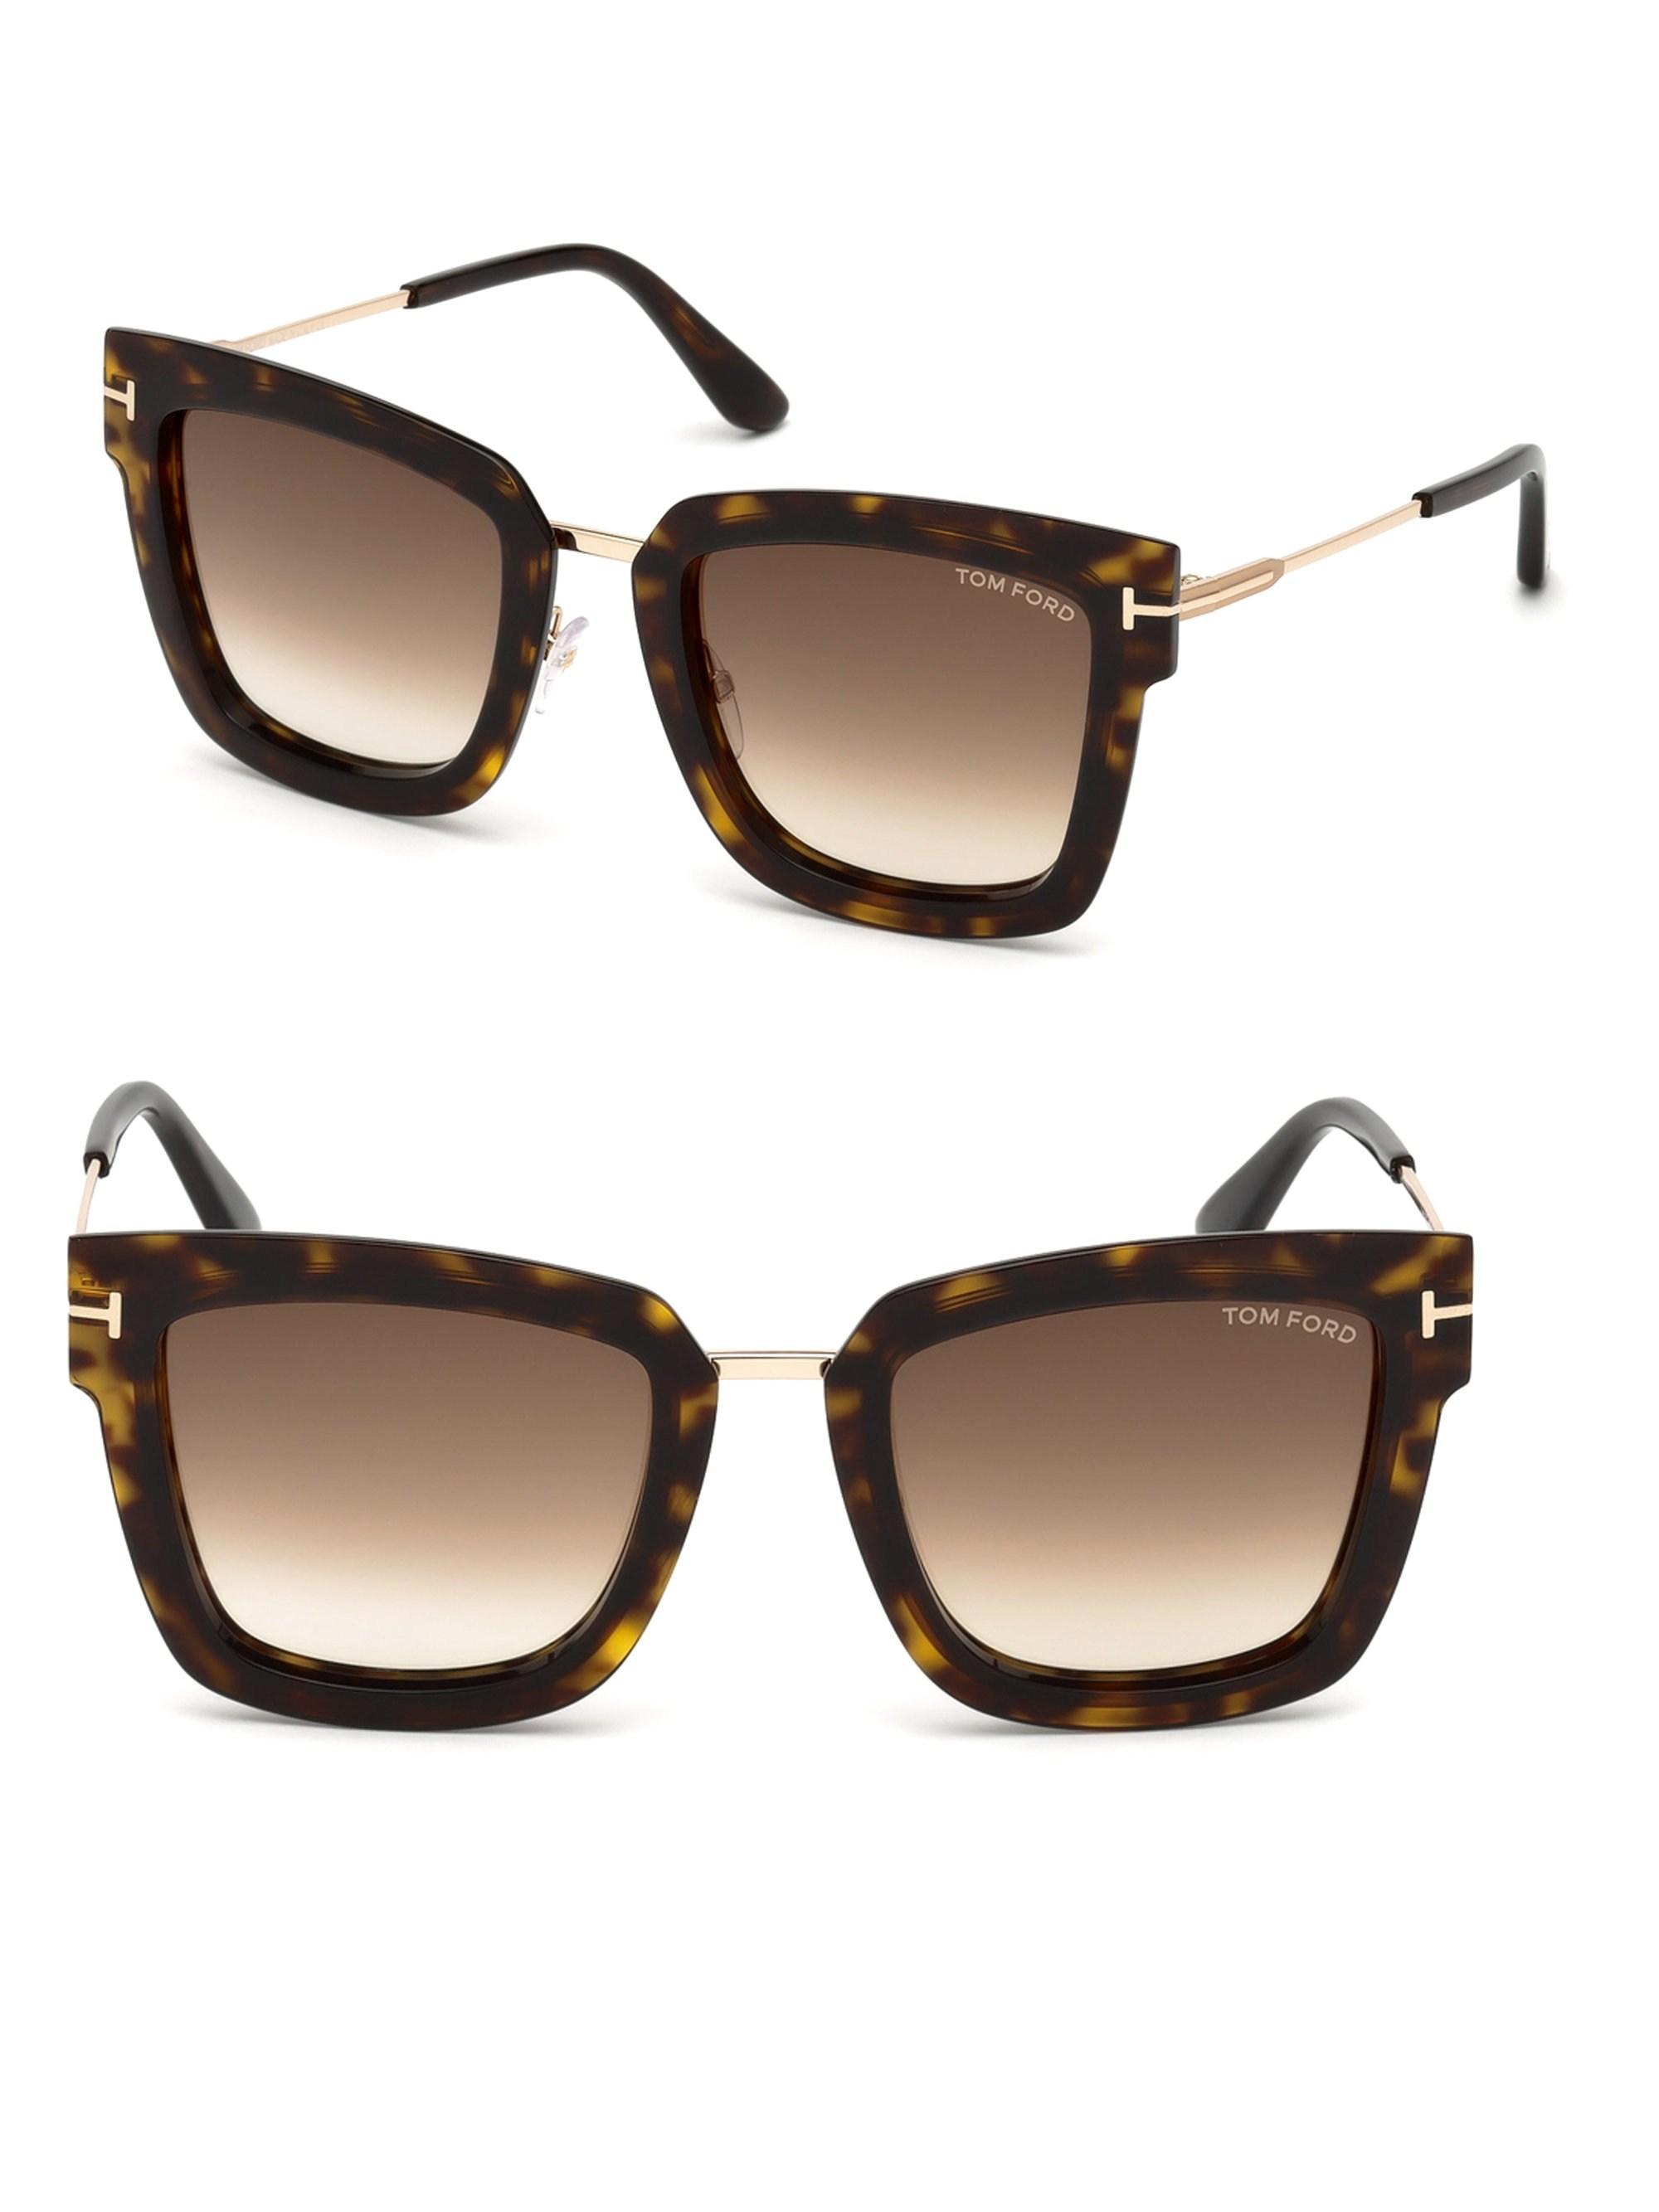 3e32701b02 Tom Ford - Brown Women s Lara Square Sunglasses - Havana - Lyst. View  fullscreen